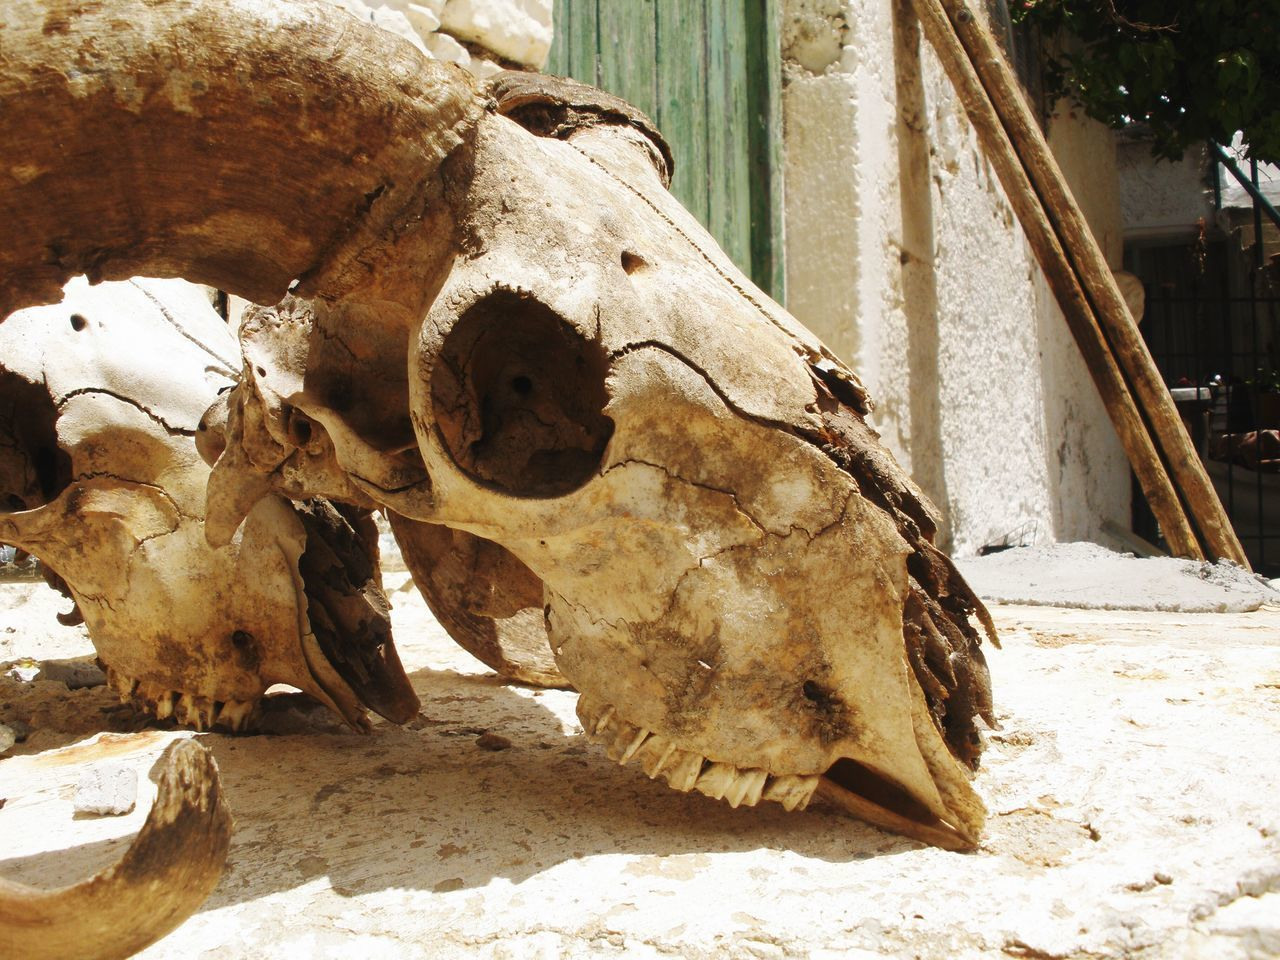 animal, animal themes, animal body part, animal skull, no people, bone, day, close-up, animal wildlife, one animal, nature, vertebrate, sunlight, mammal, architecture, animal bone, focus on foreground, livestock, outdoors, animal head, herbivorous